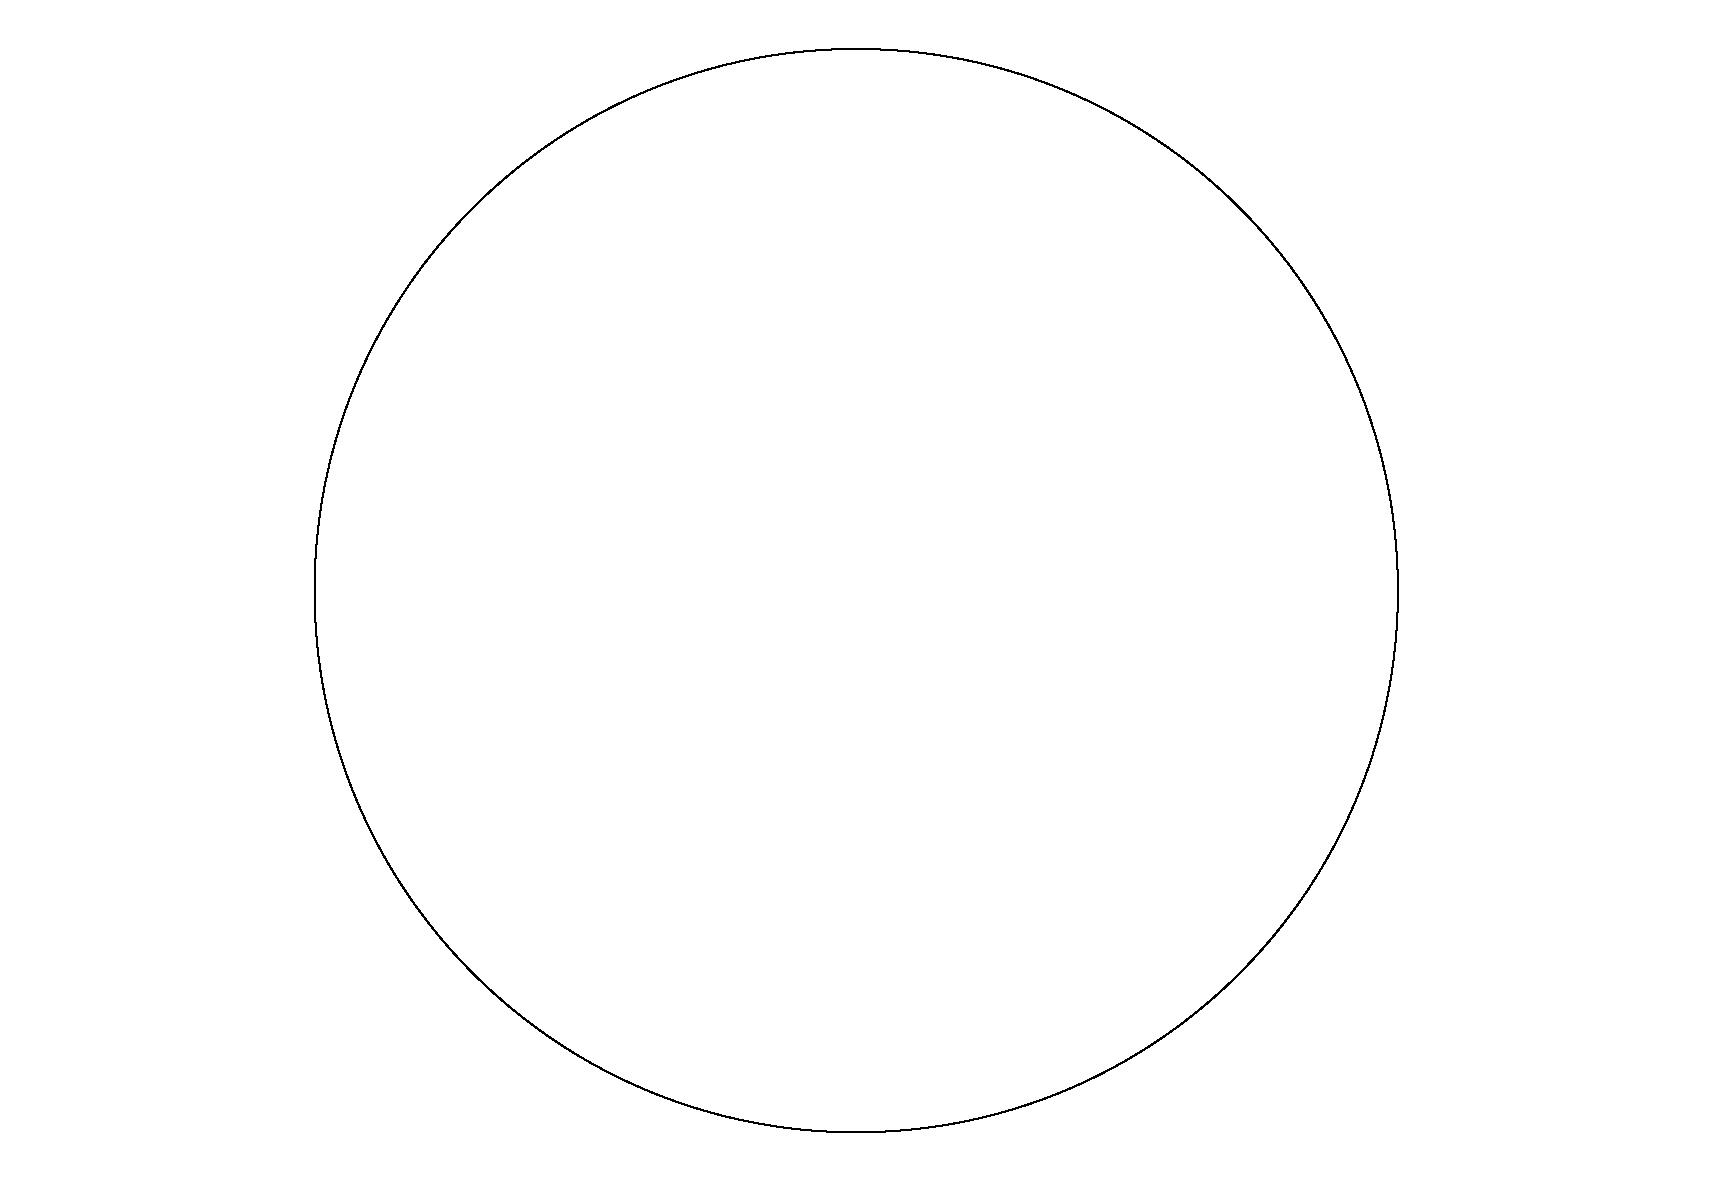 Раскраски фигуры, круг